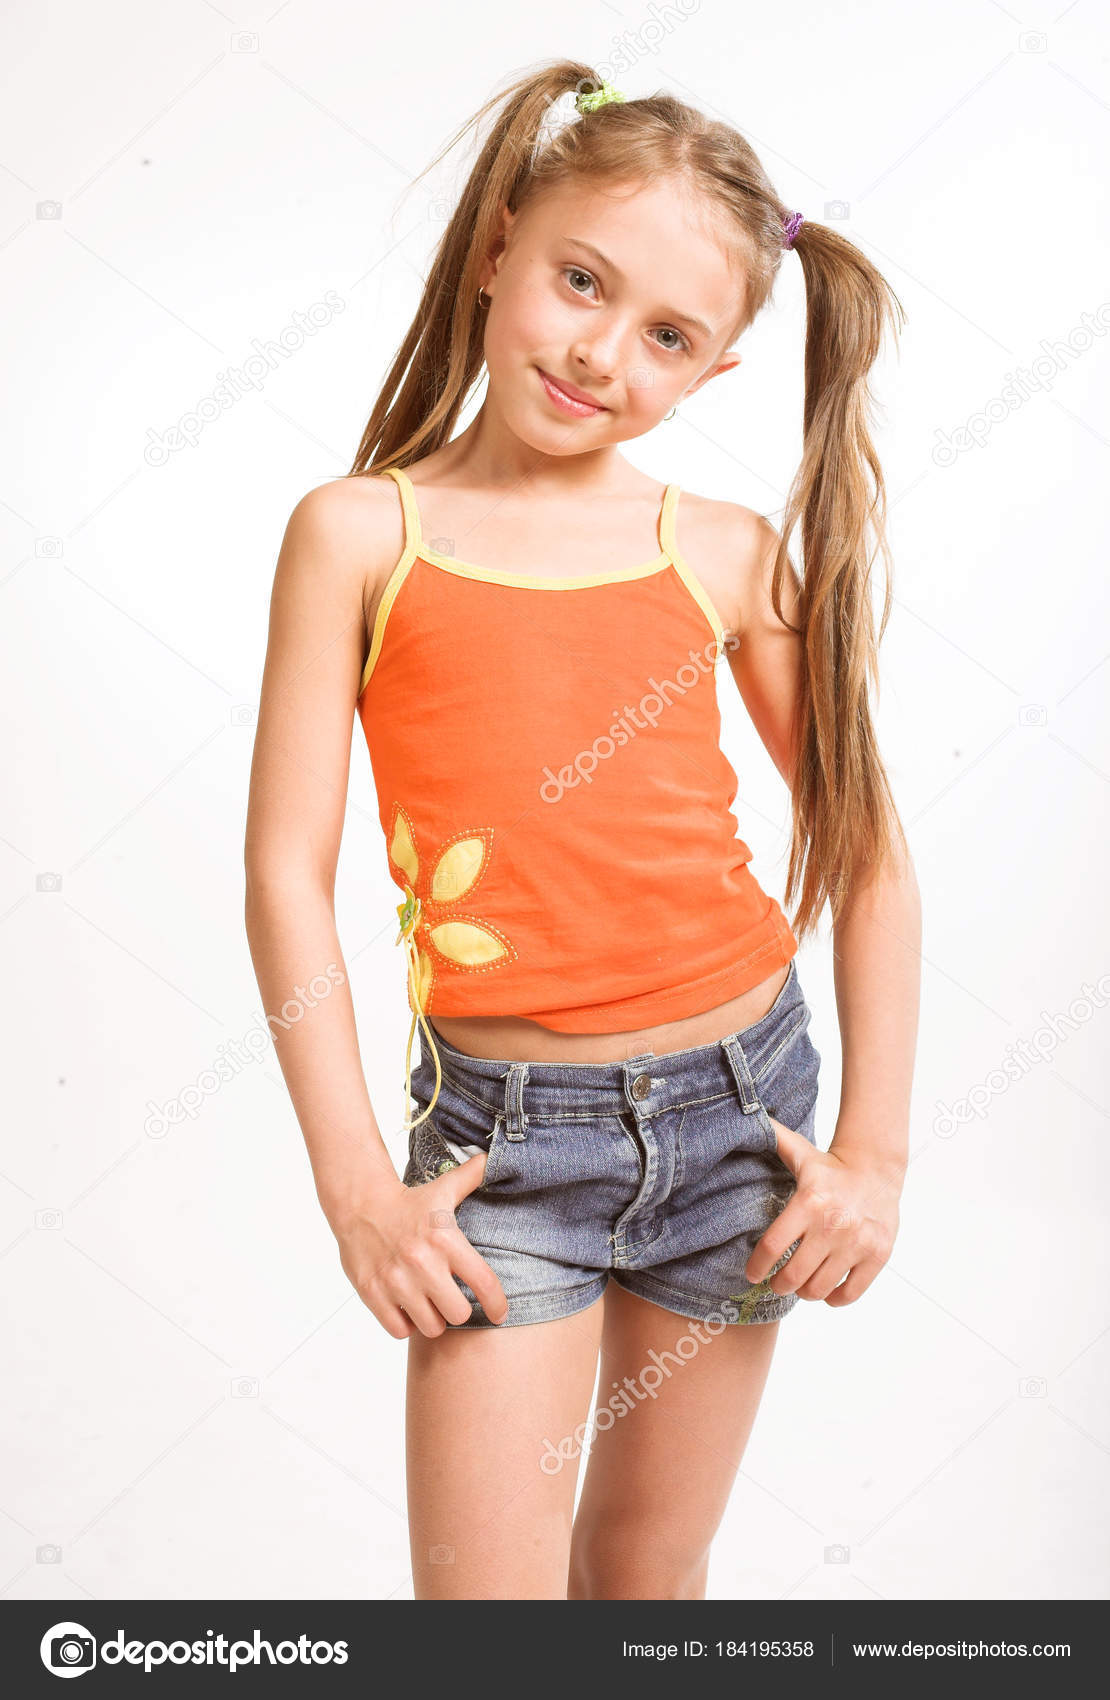 Depositphotos Stock Photo Little Girl Casual Wear Kleines Madchen Freizeitkleidung Stockfoto